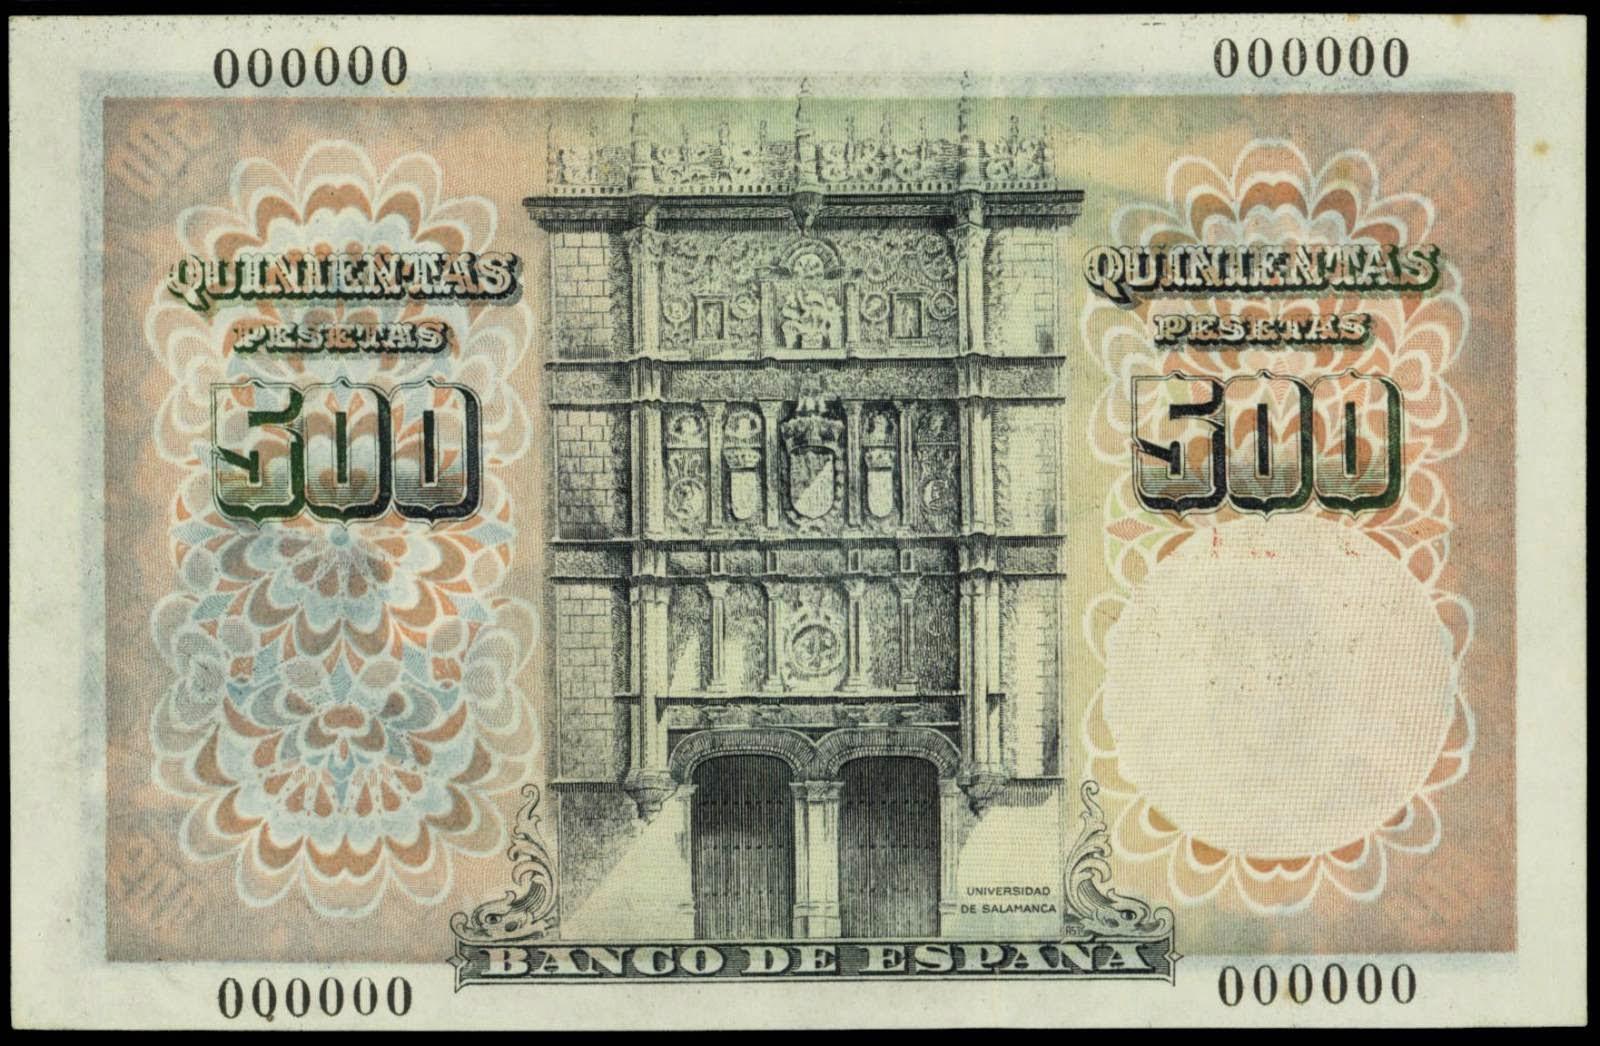 Spain currency 500 Pesetas banknote 1946 Salamanca